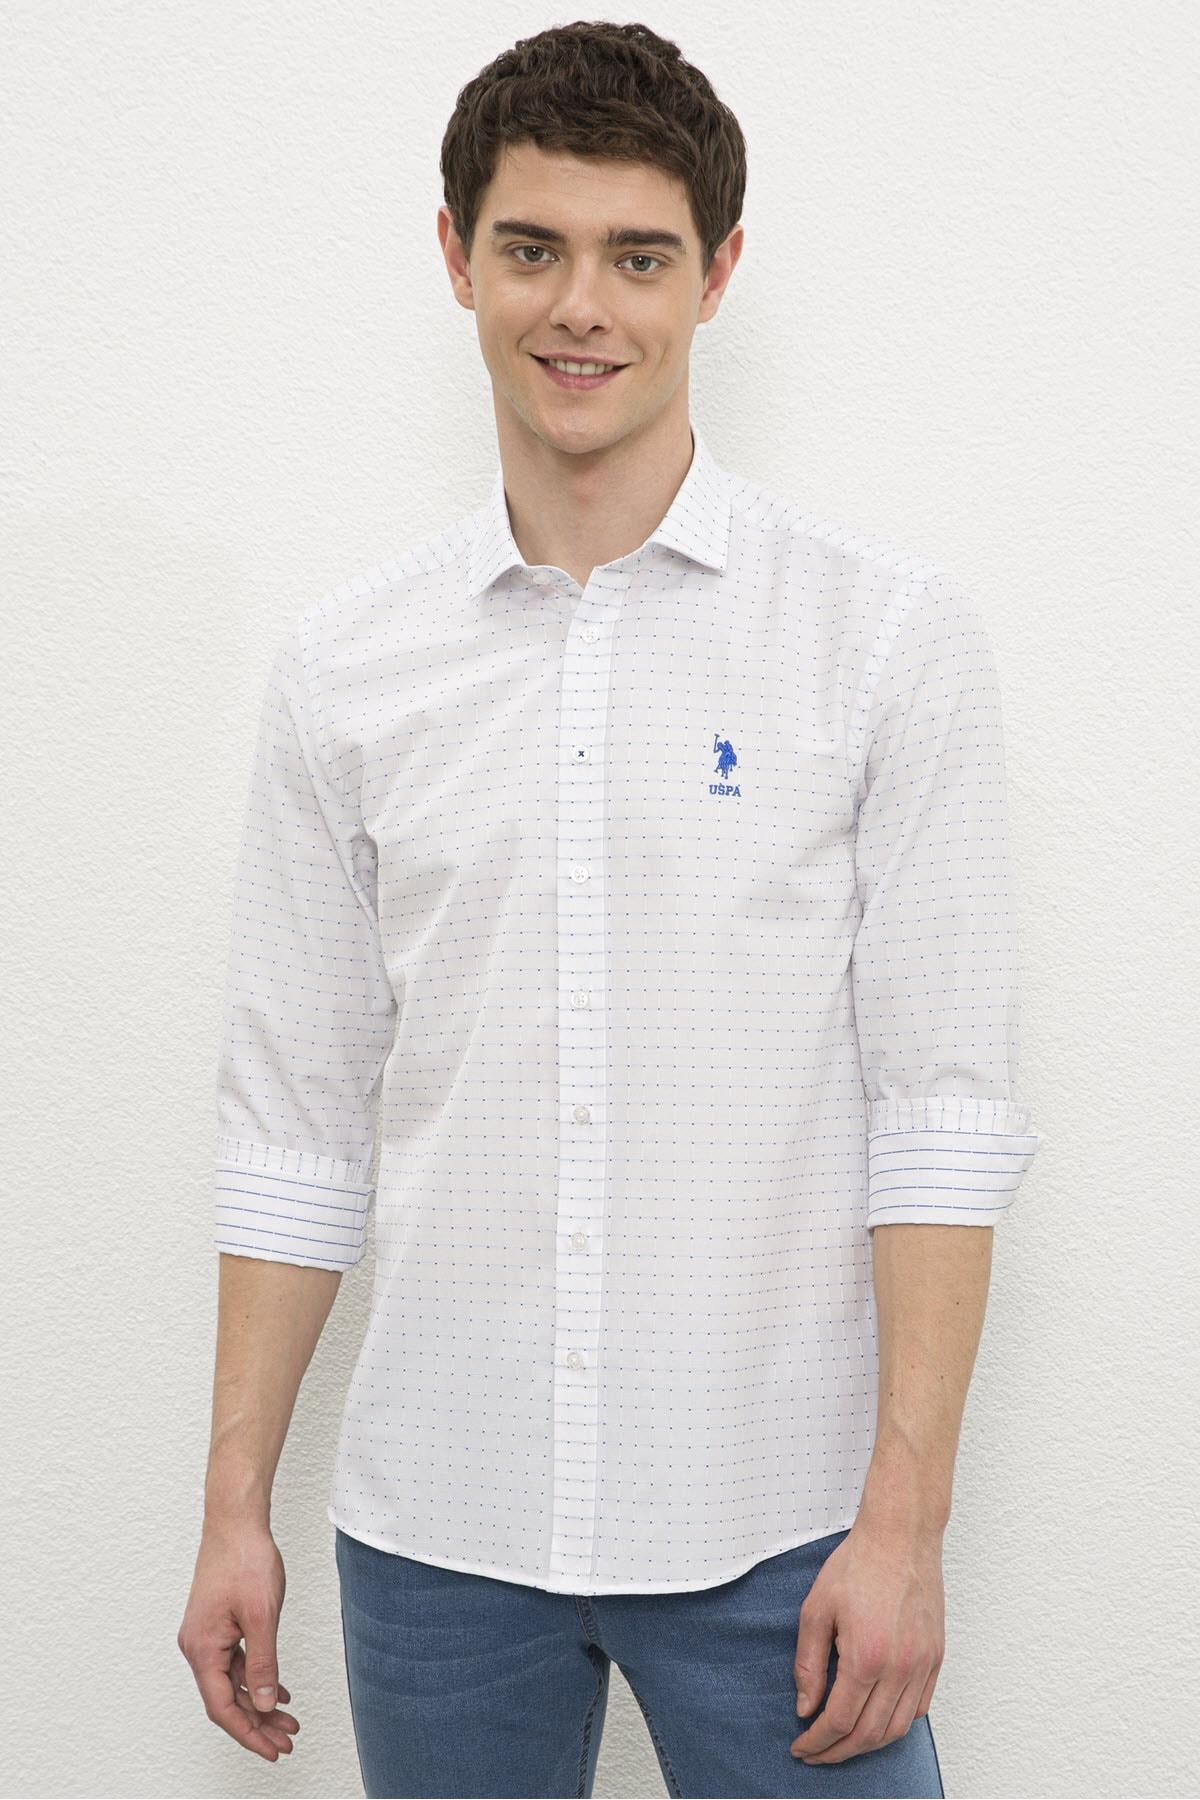 Beyaz Erkek Gömlek G081Sz004.000.1180207